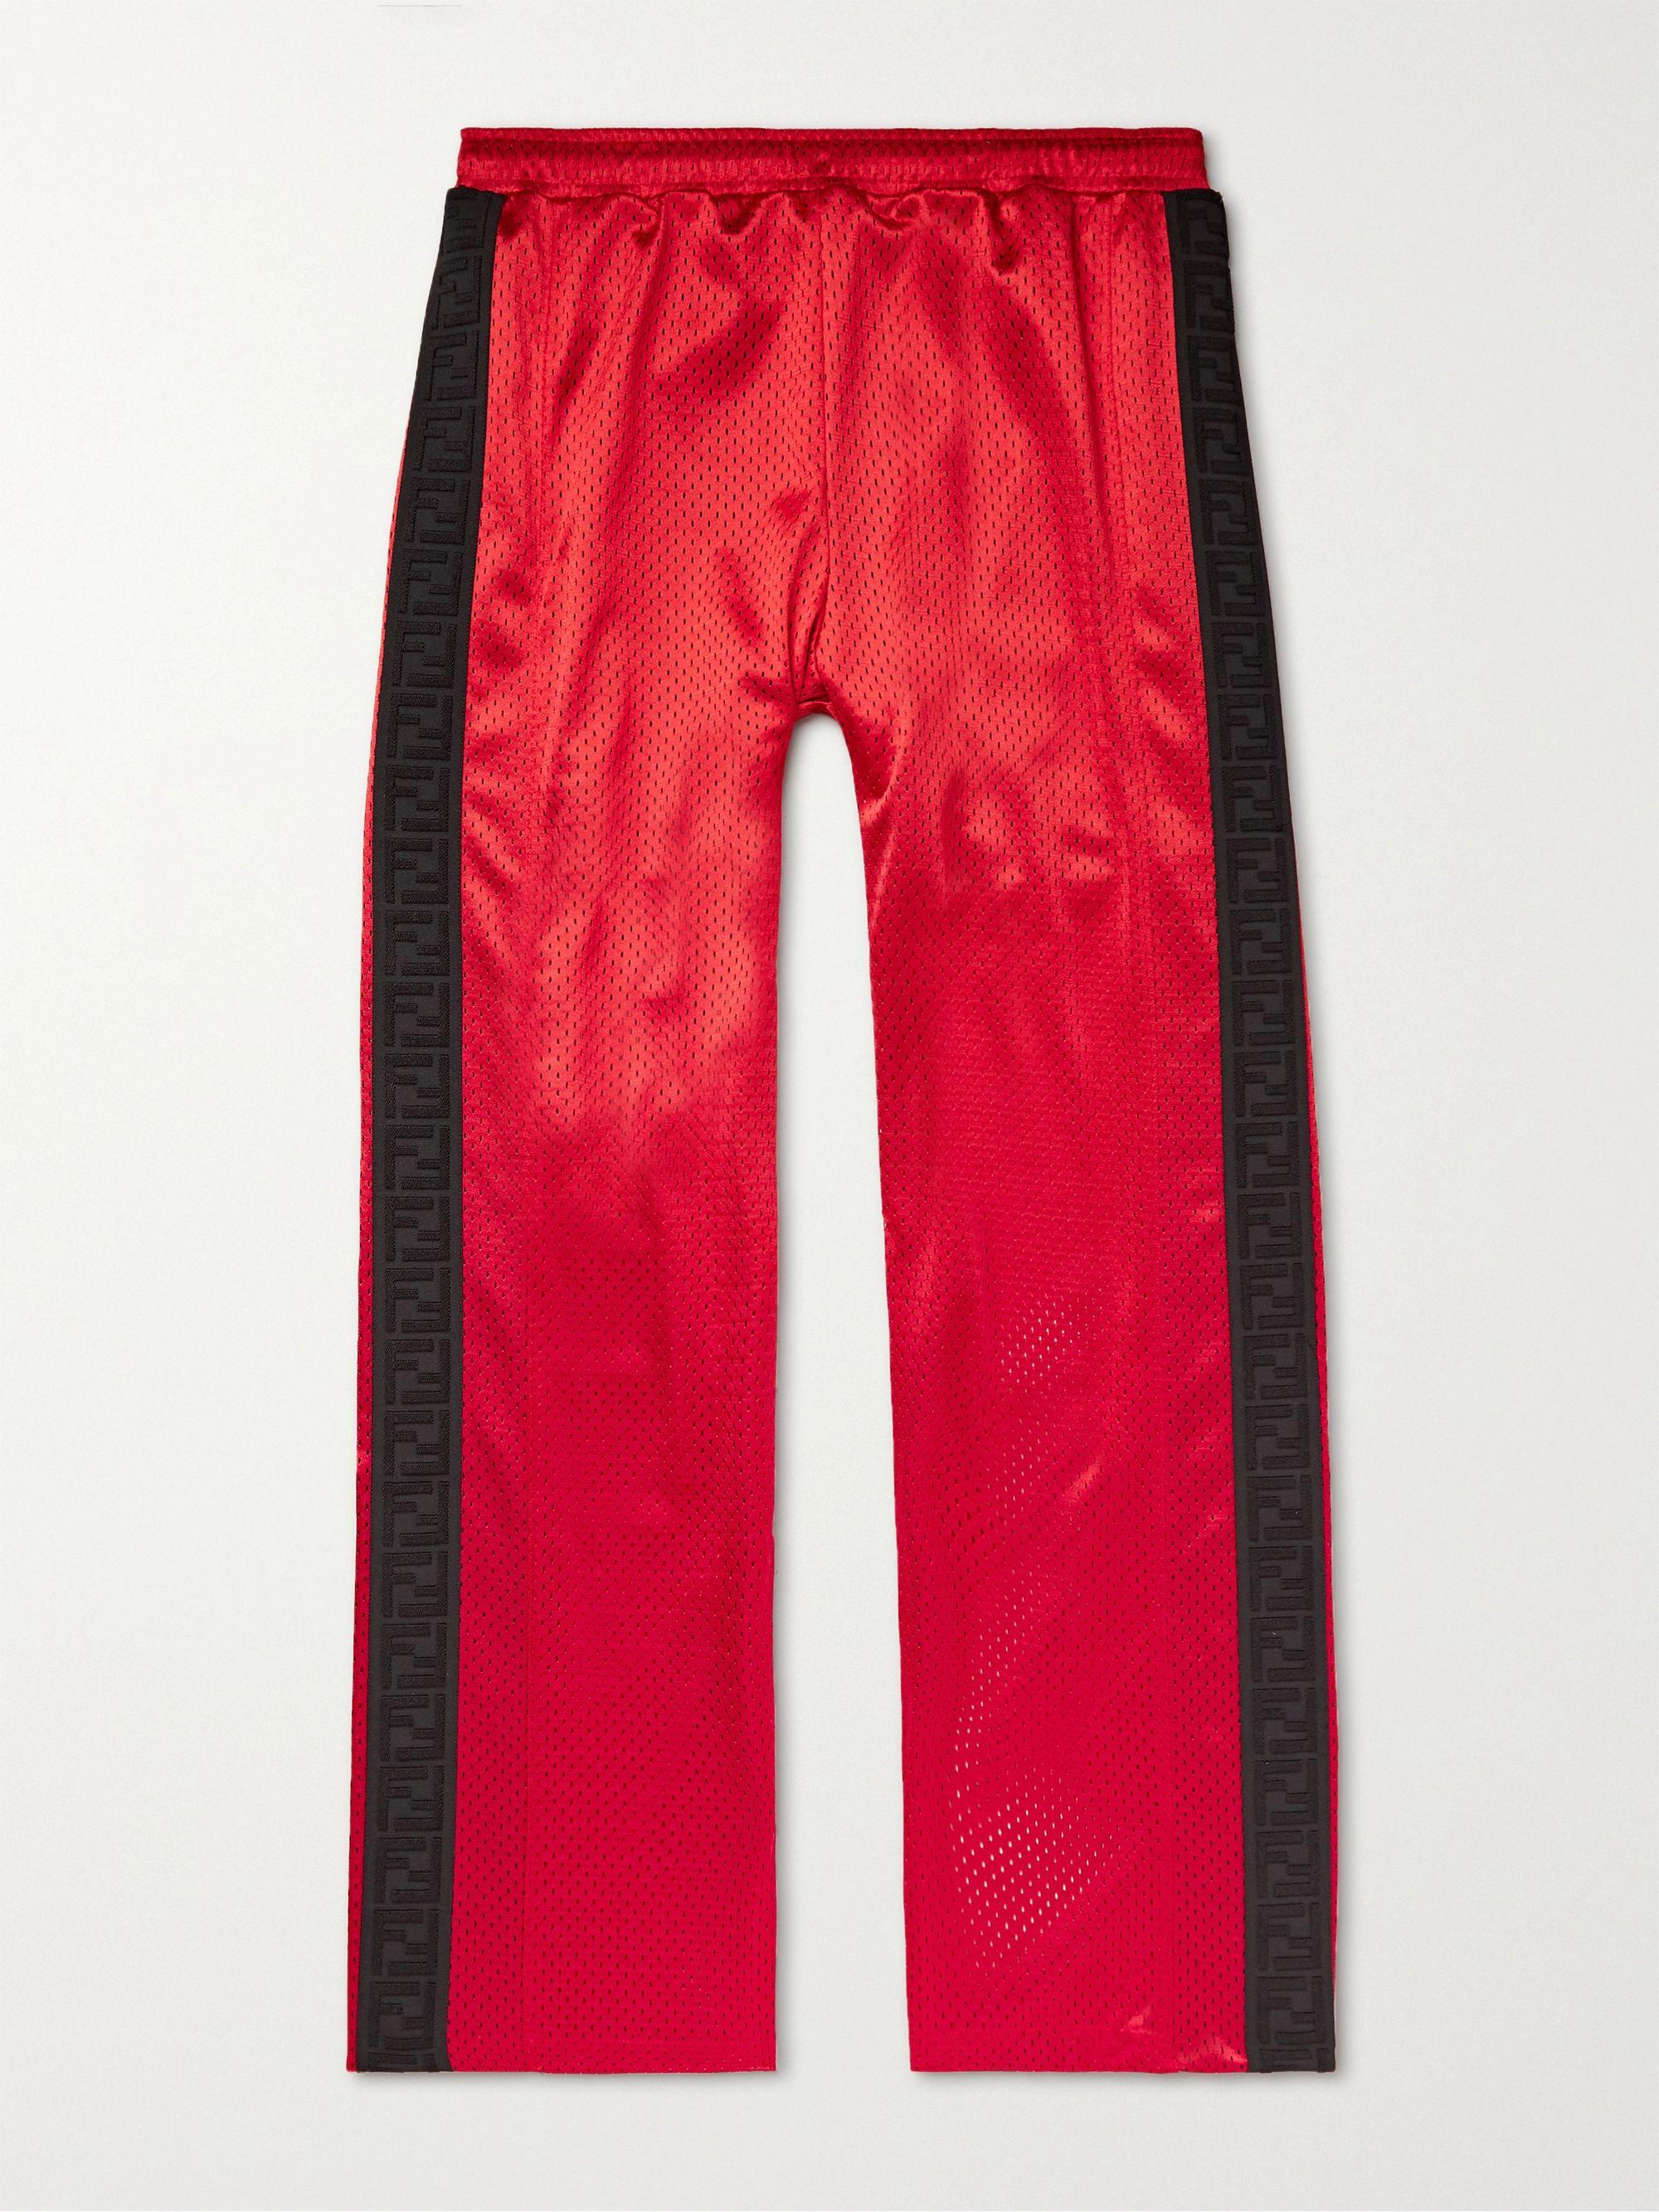 FENDI Logo-Trimmed Cotton-Mesh Track Pants